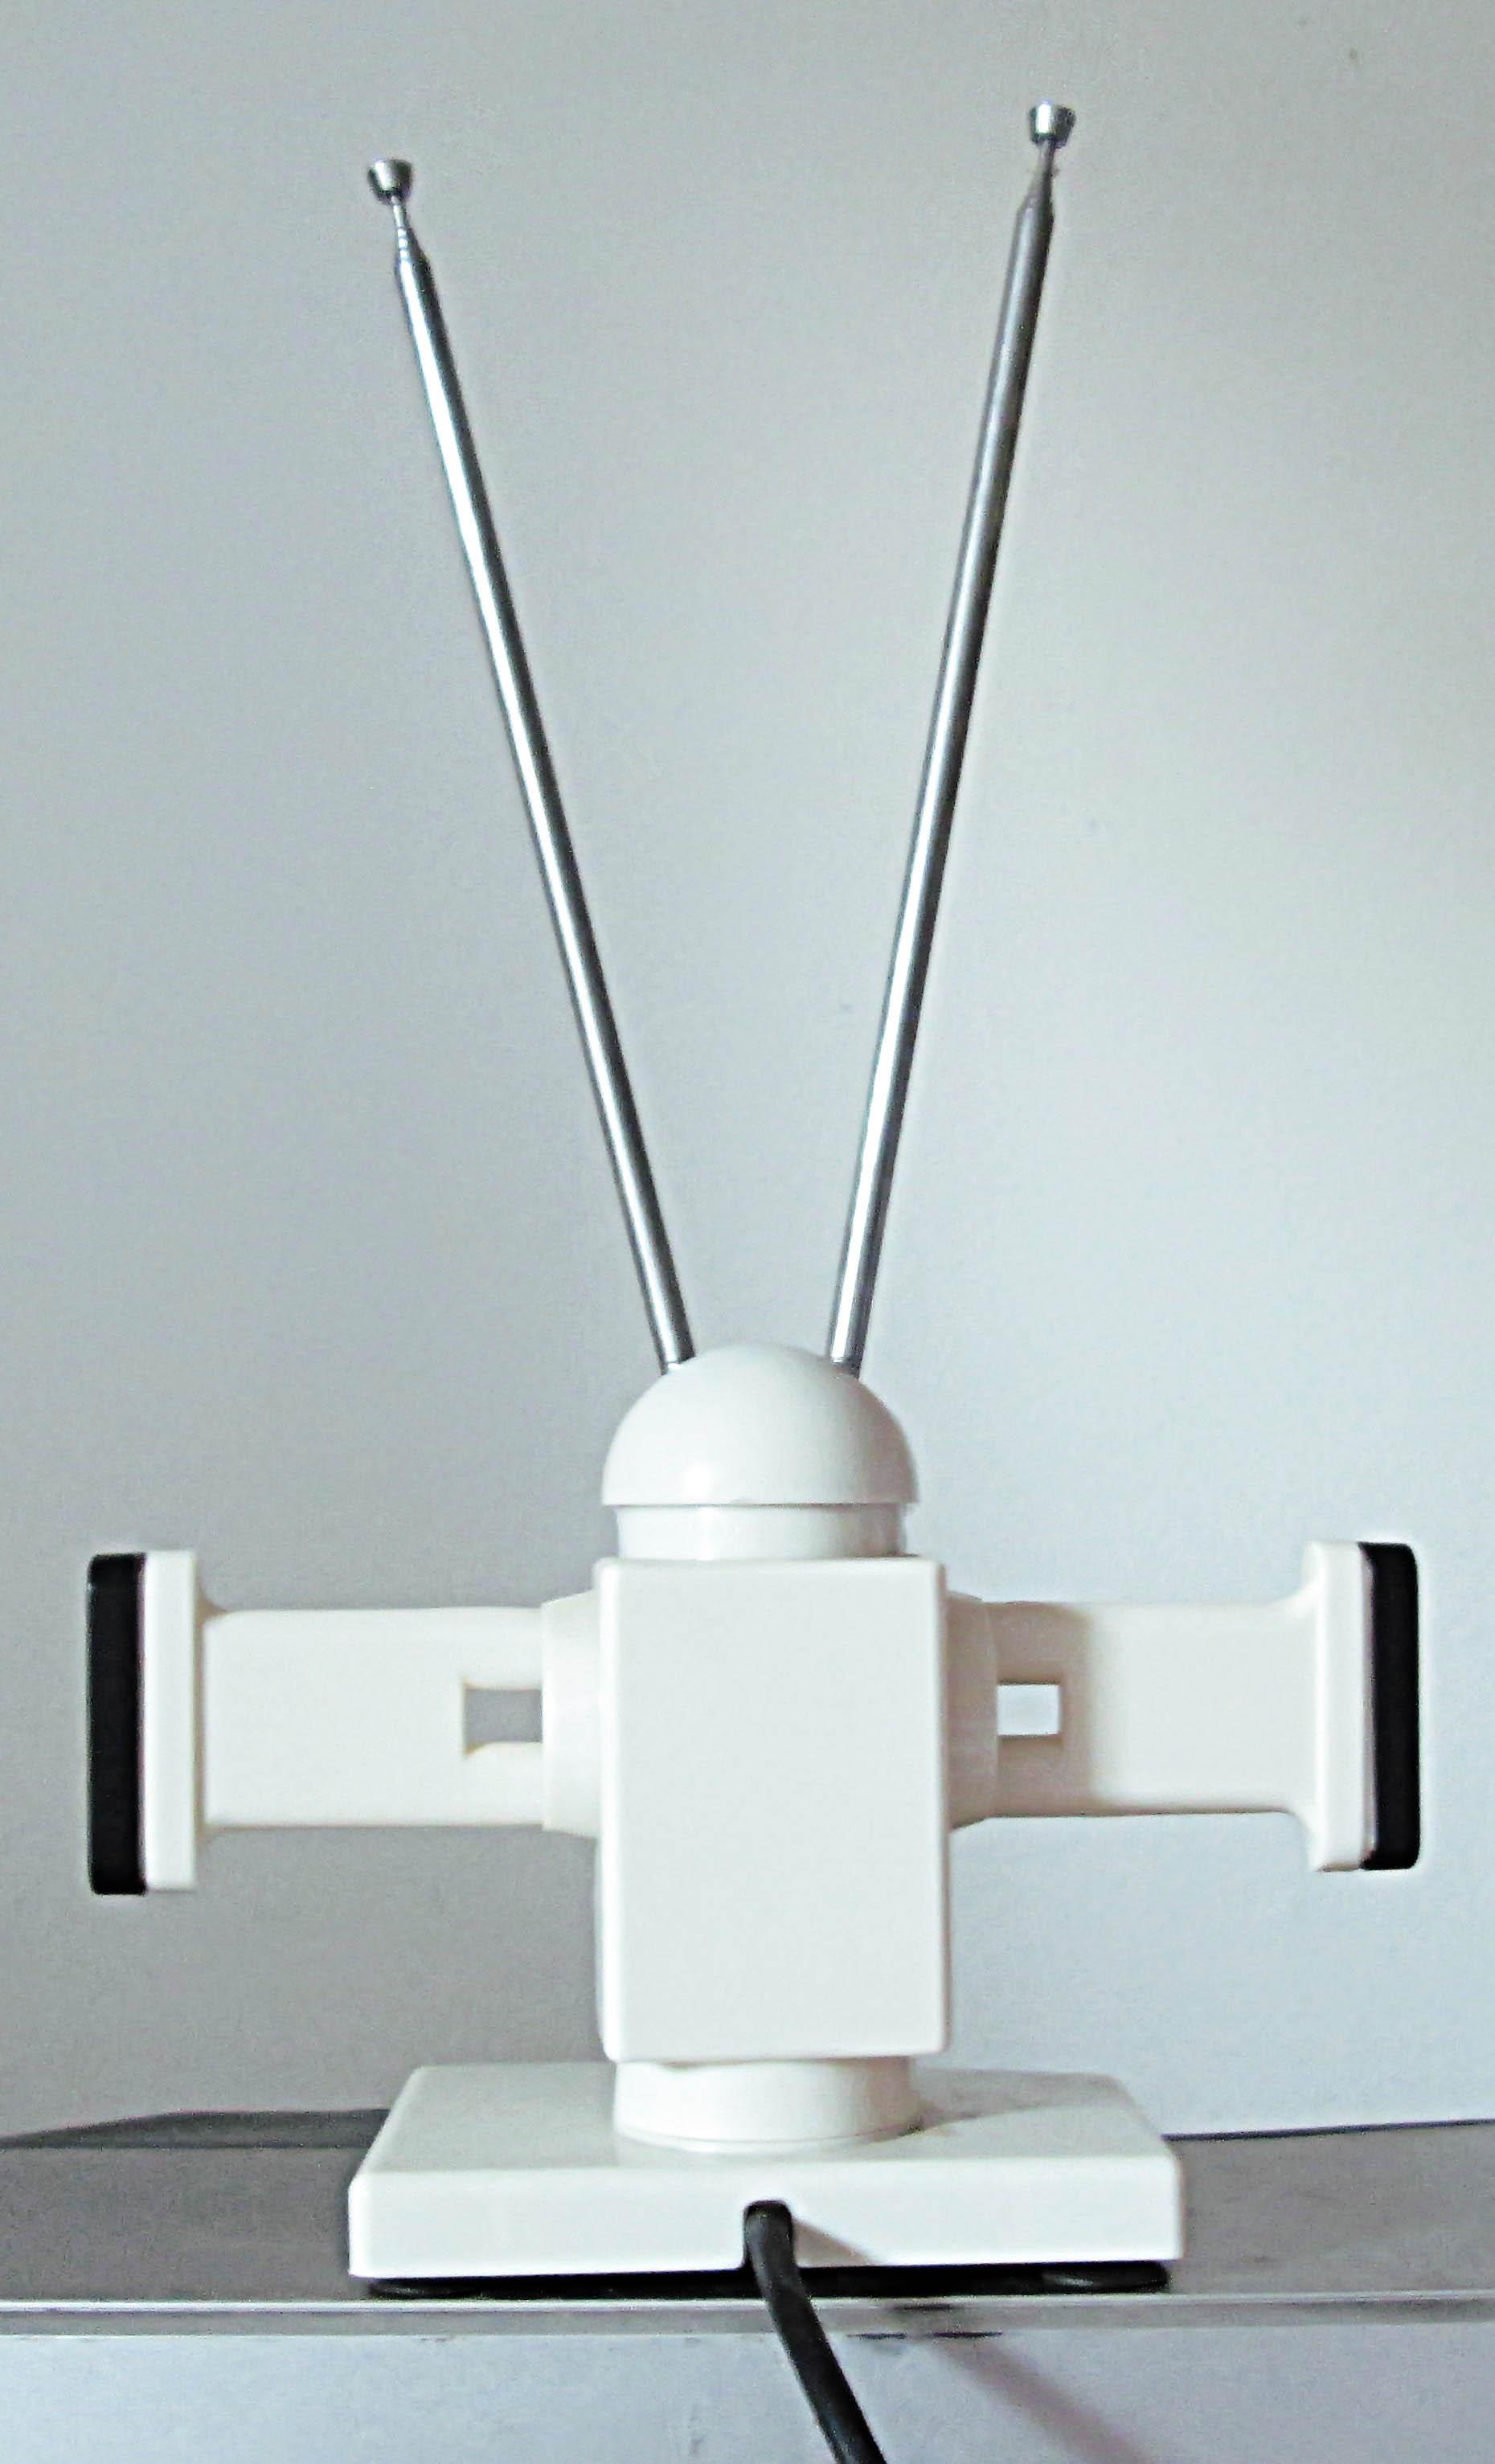 old tv antenna, Antenna, Receiver, White, Vintage, HQ Photo